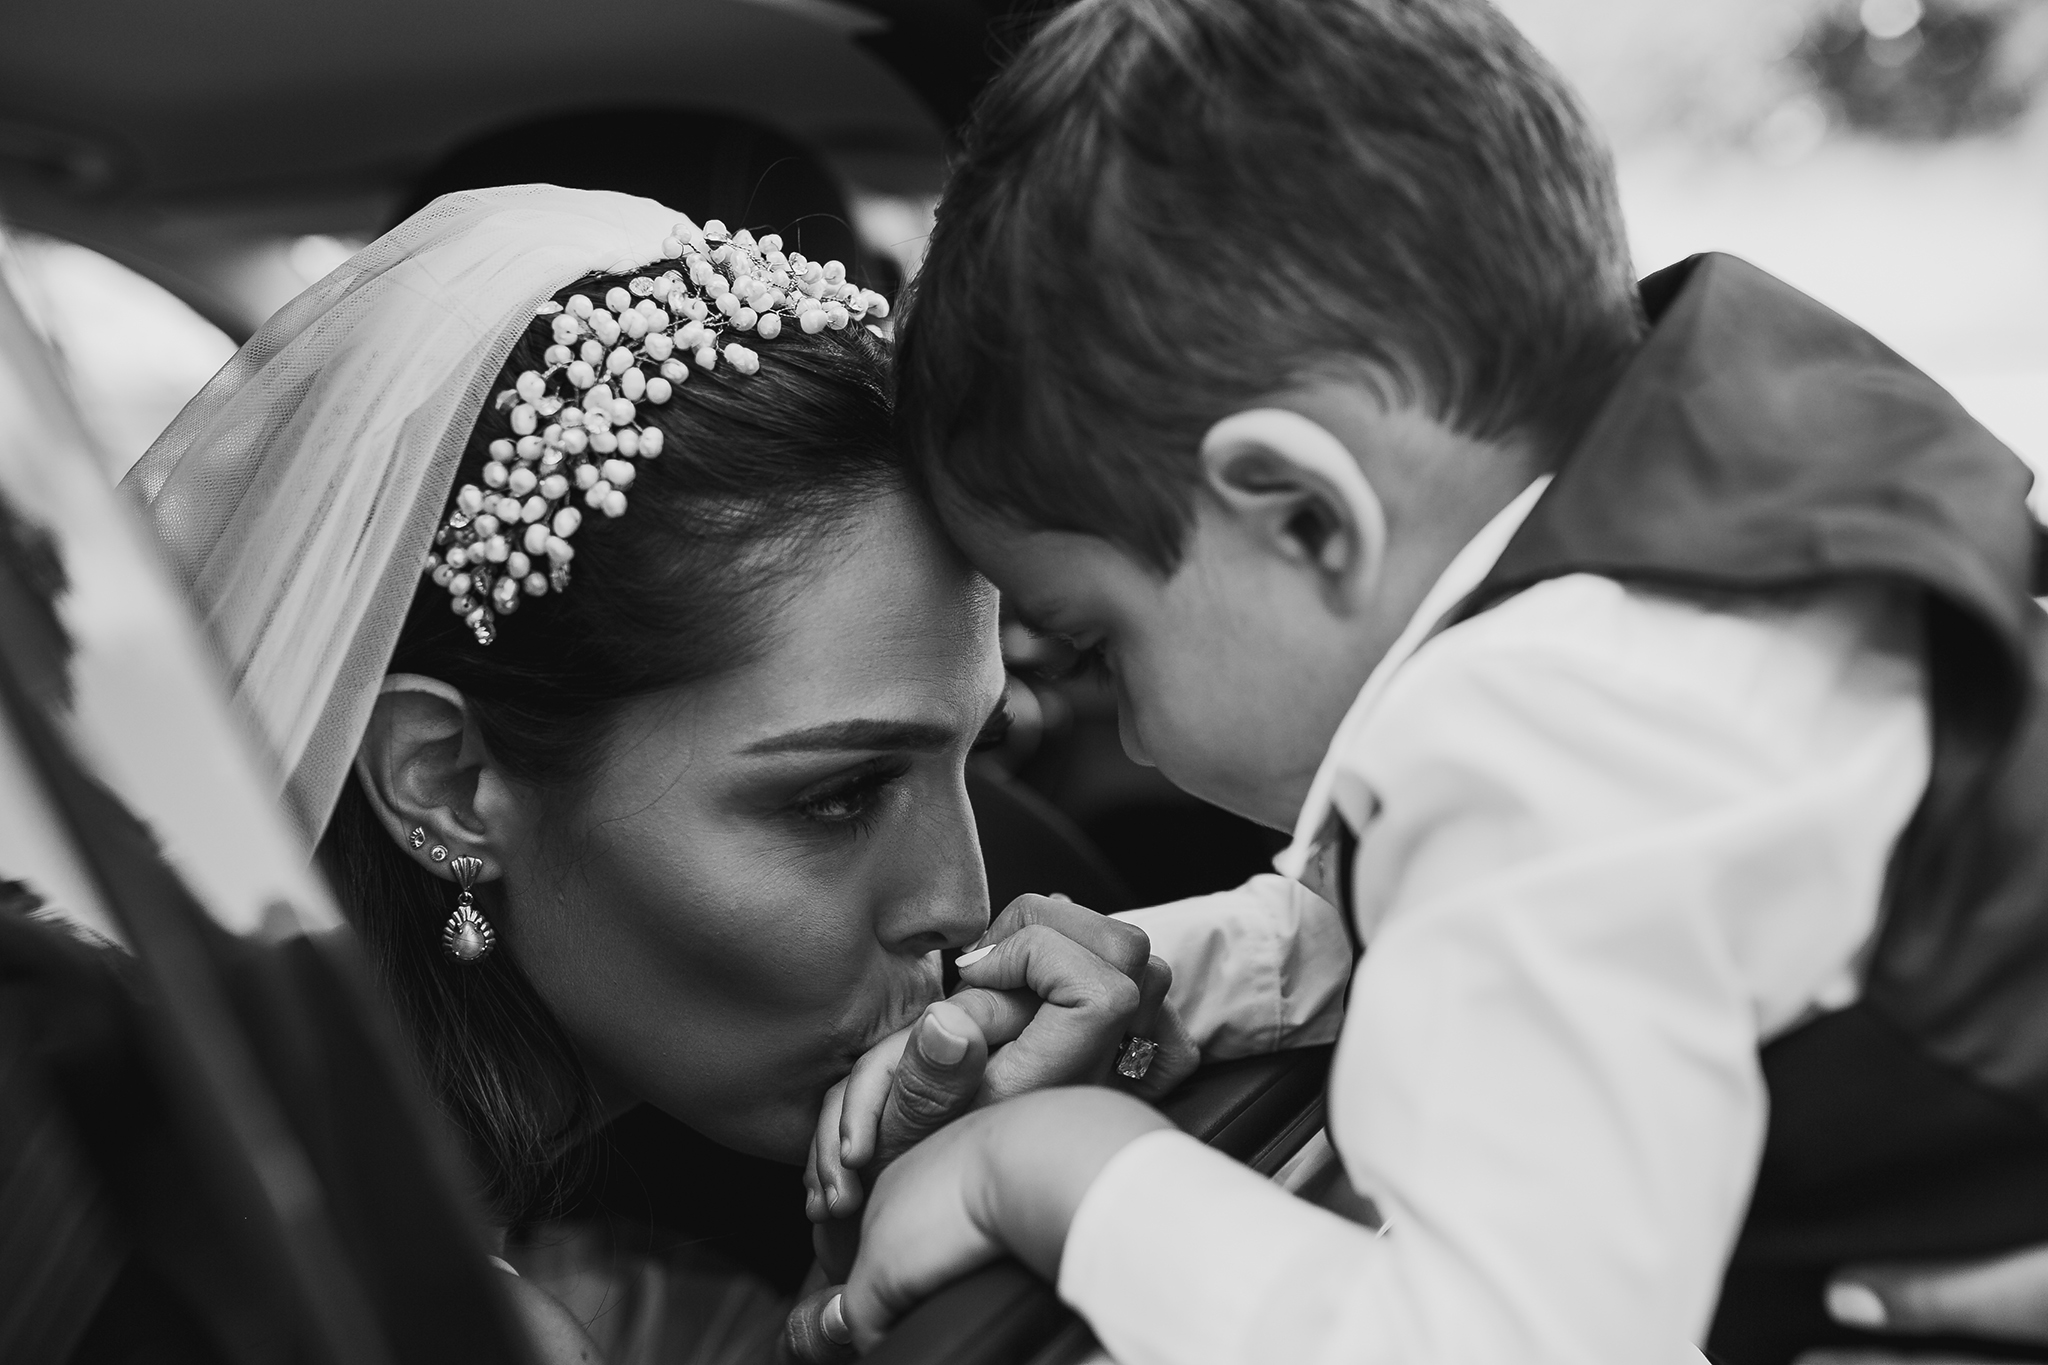 0528R&F__WeddingDestination_Weddingmerida_BodaMexico_FotografoDeBodas_FabrizioSimoneenFotografo.jpg